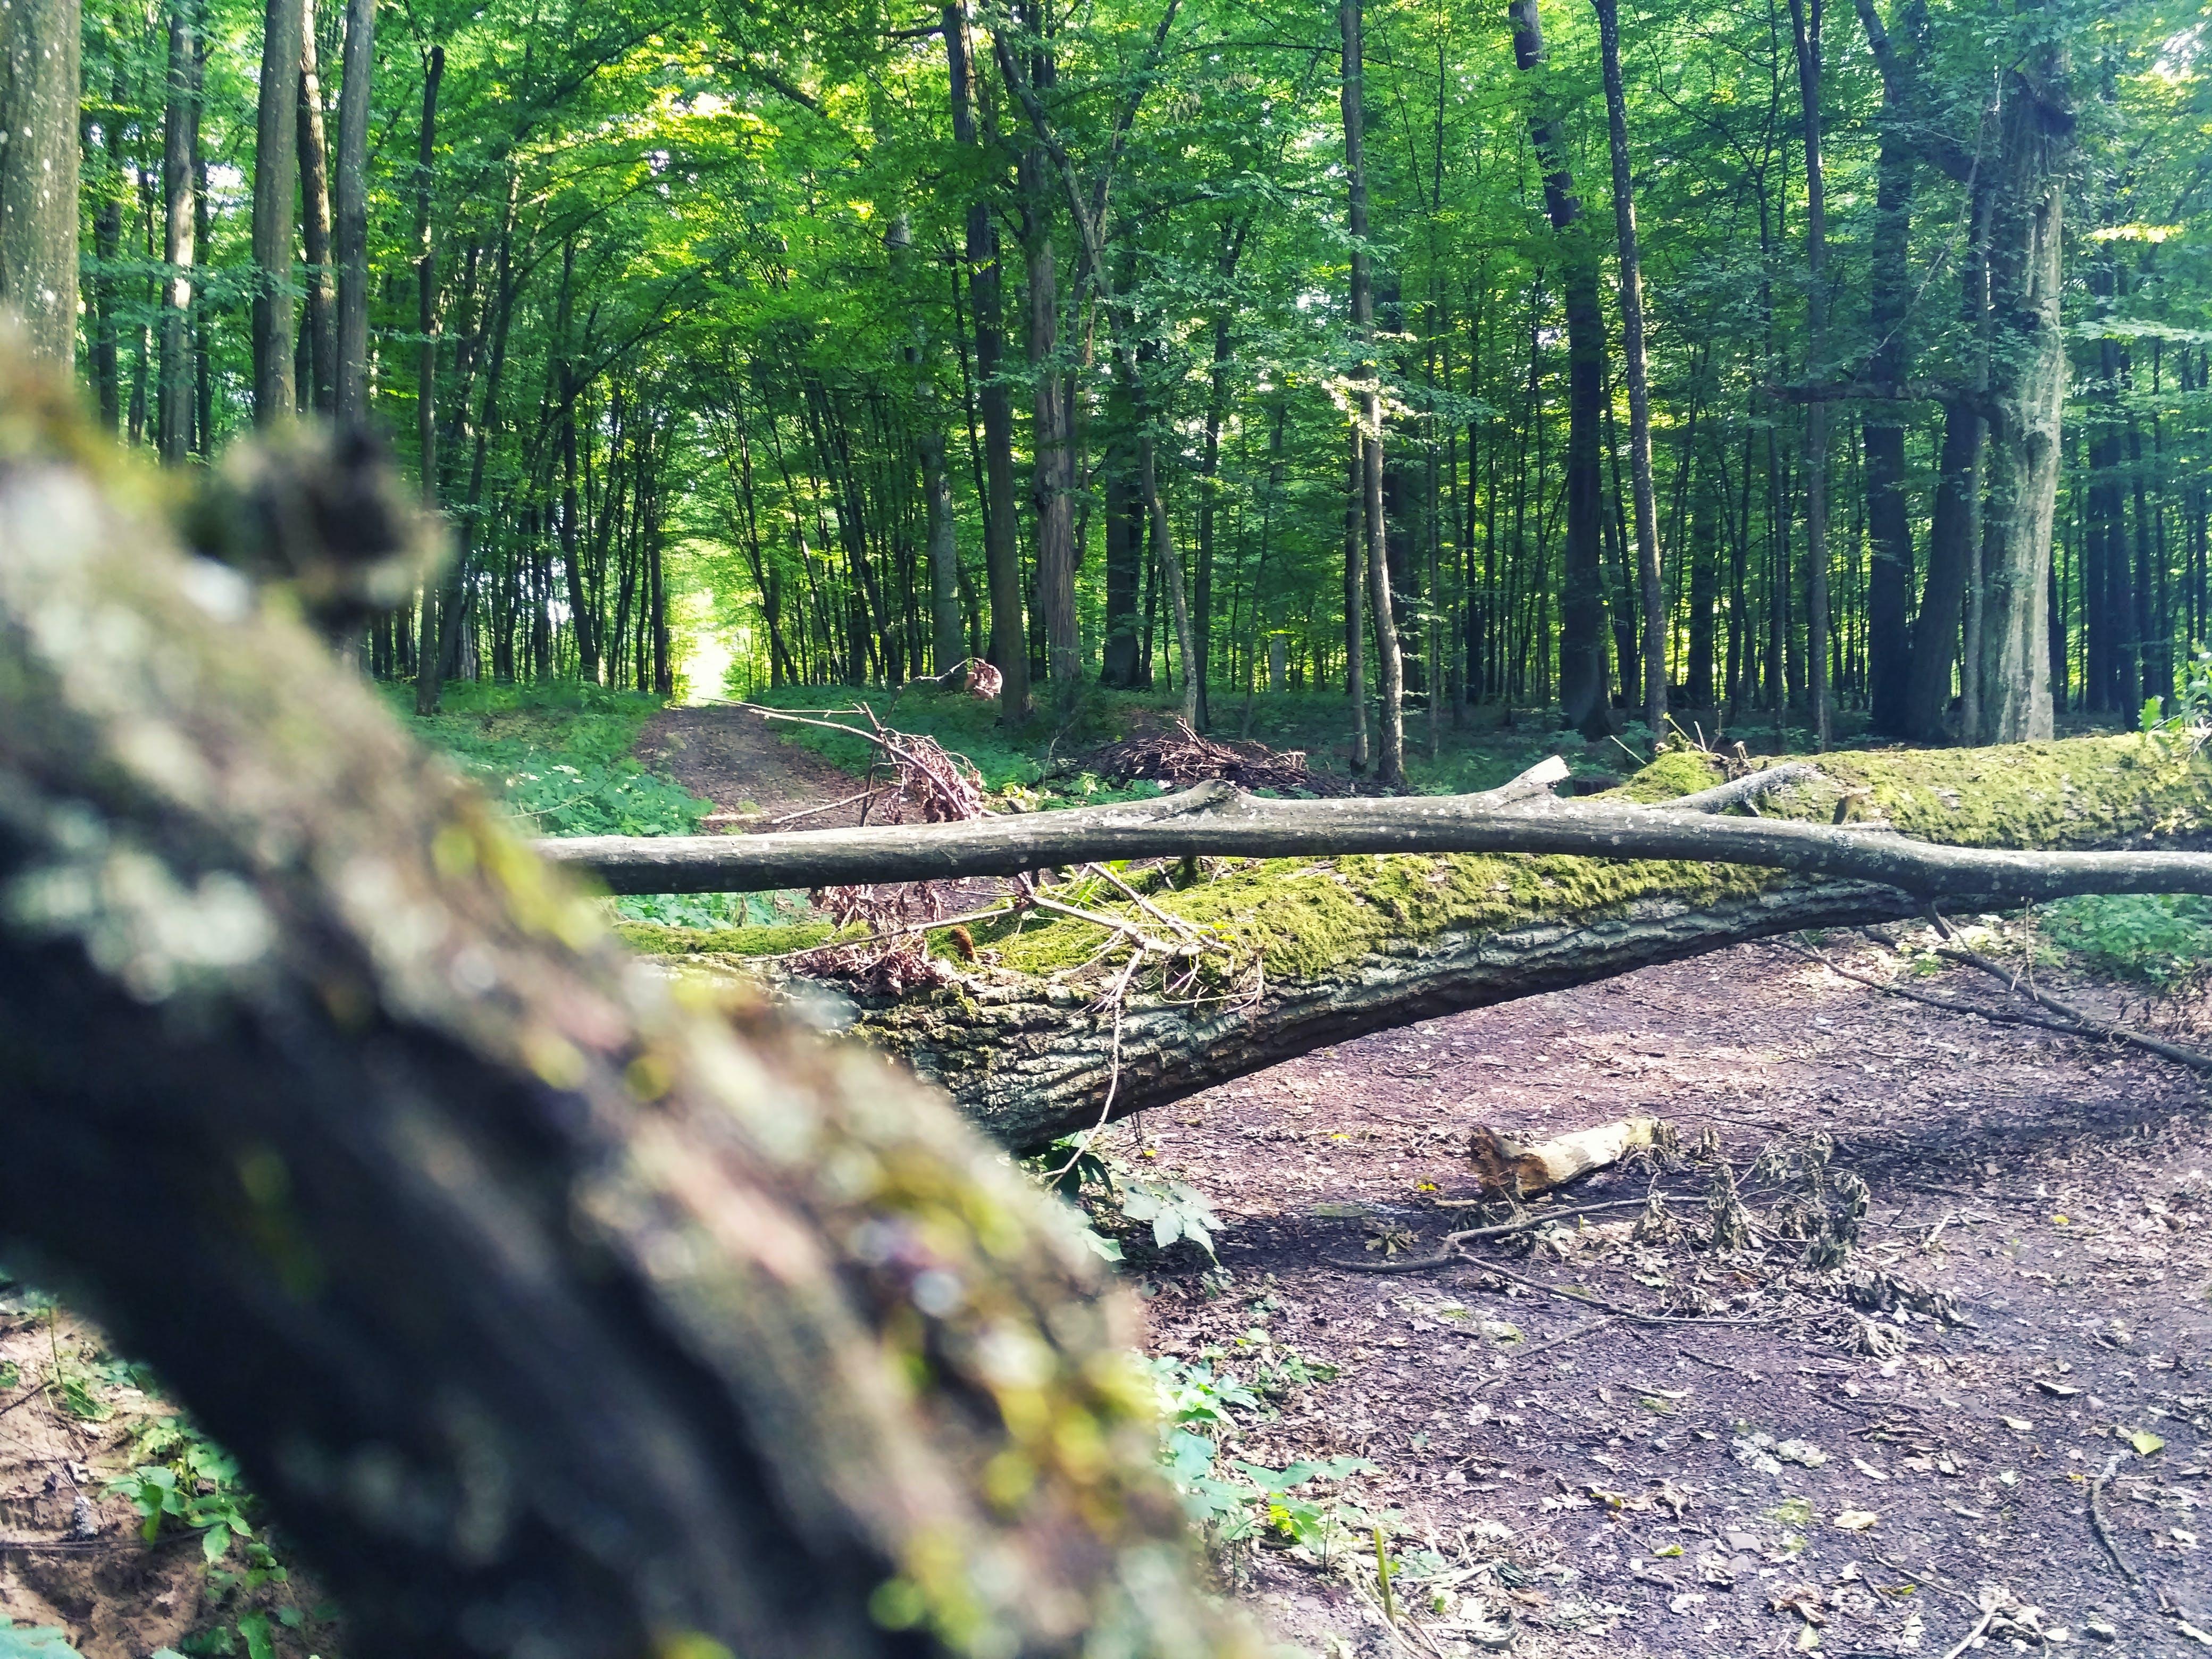 Kostenloses Stock Foto zu bäume, baumstämme, boden, erde